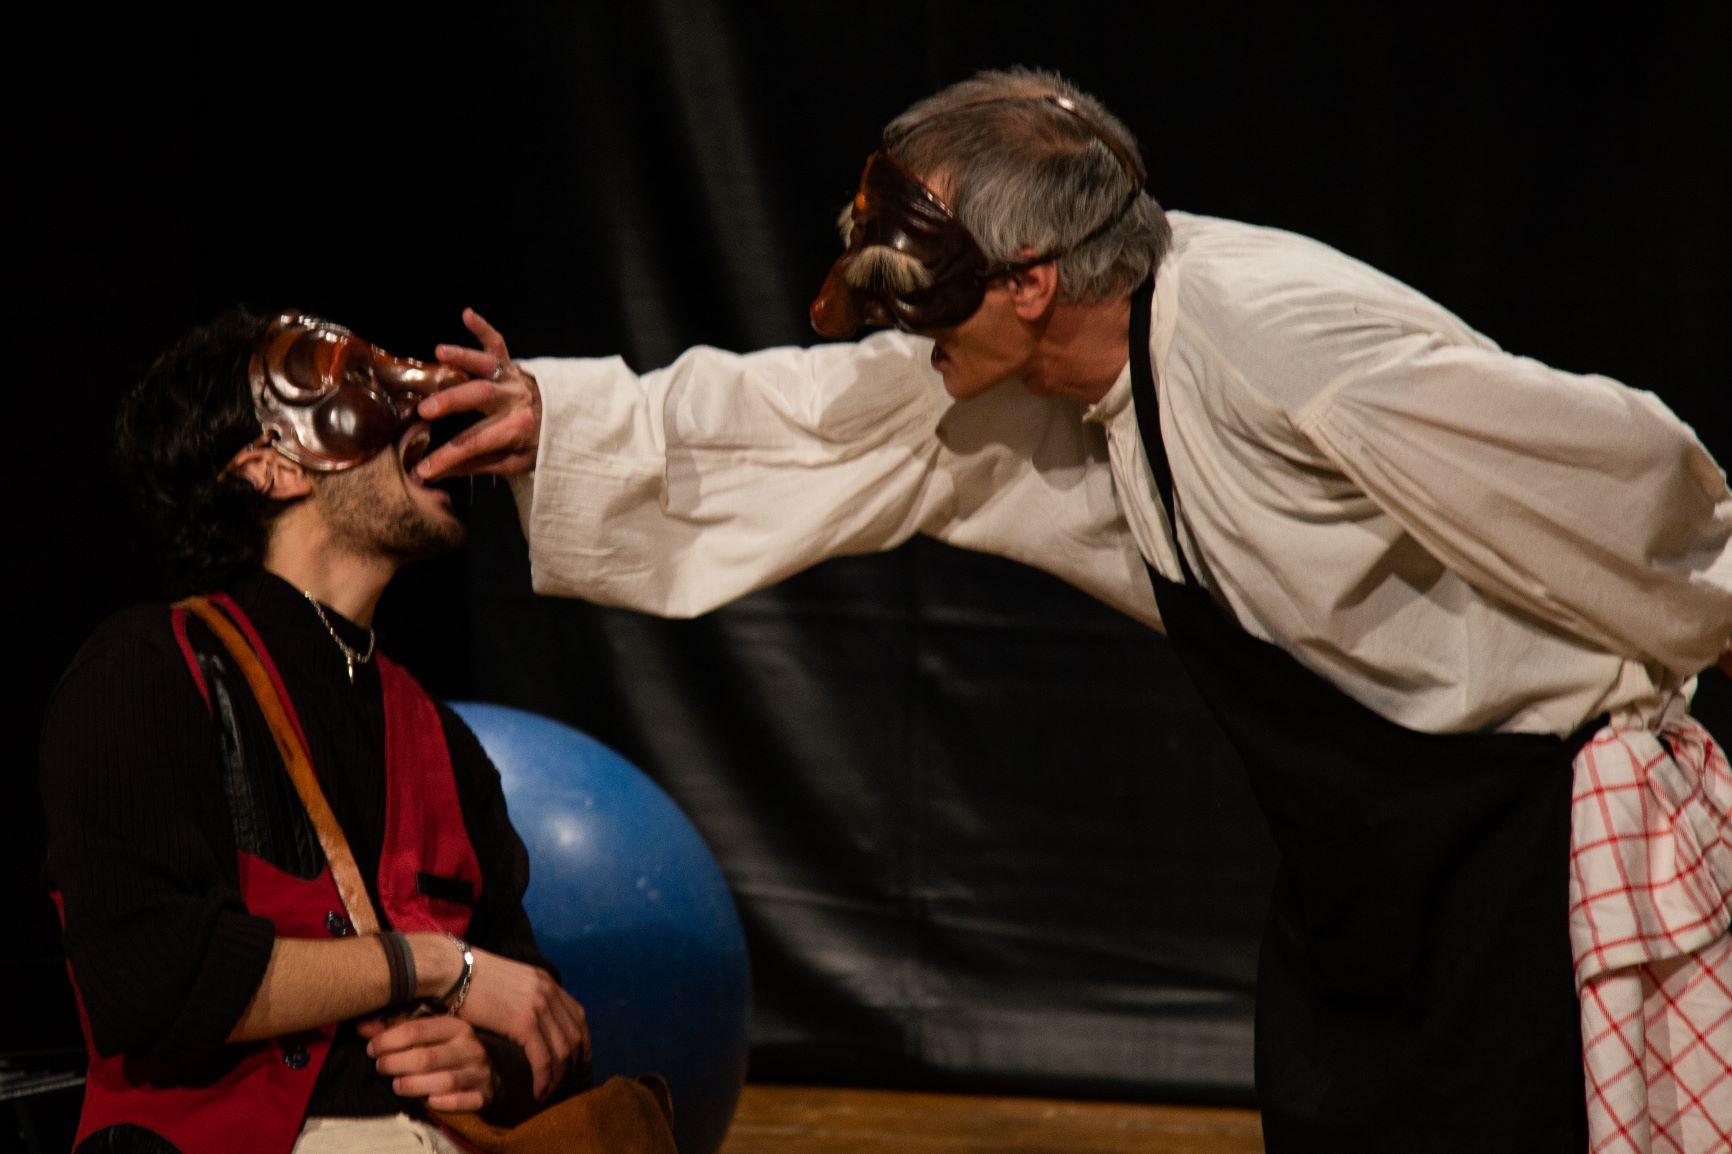 Dialogo tra Prometheu e Sisifou intorno al fegato con le cipolle